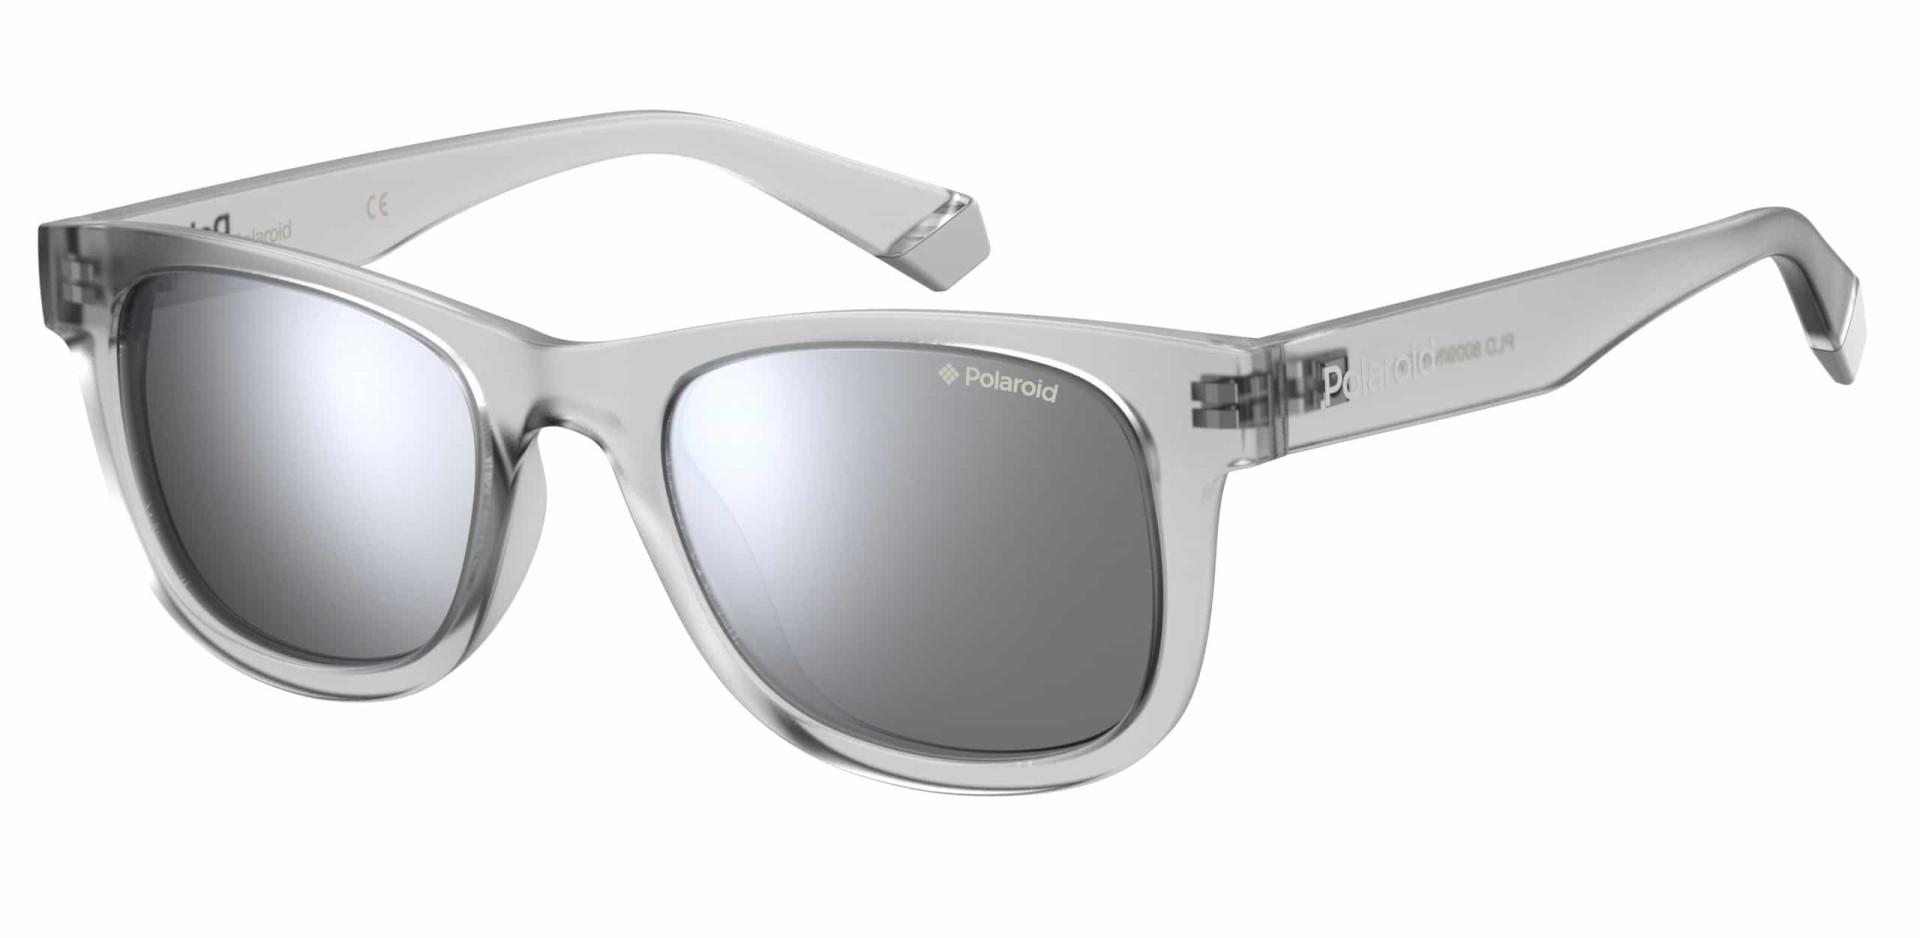 Apresentamos-lhe a coleção adorável MiniMe by POLAROID Eyewear